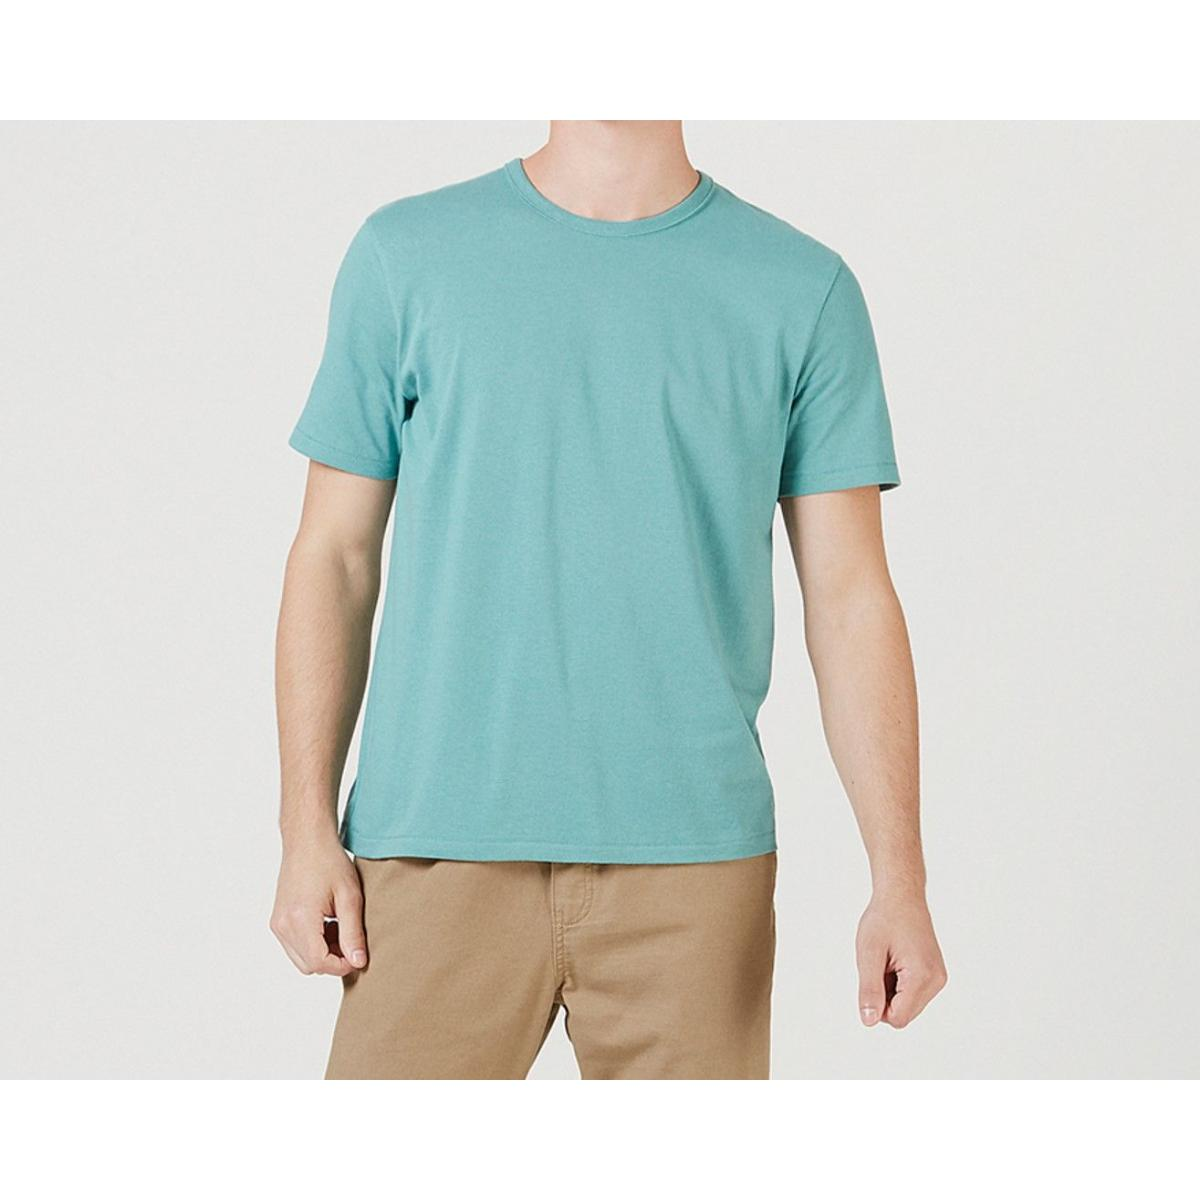 Camiseta Masculina Hering 0299 Wg9en  Verde